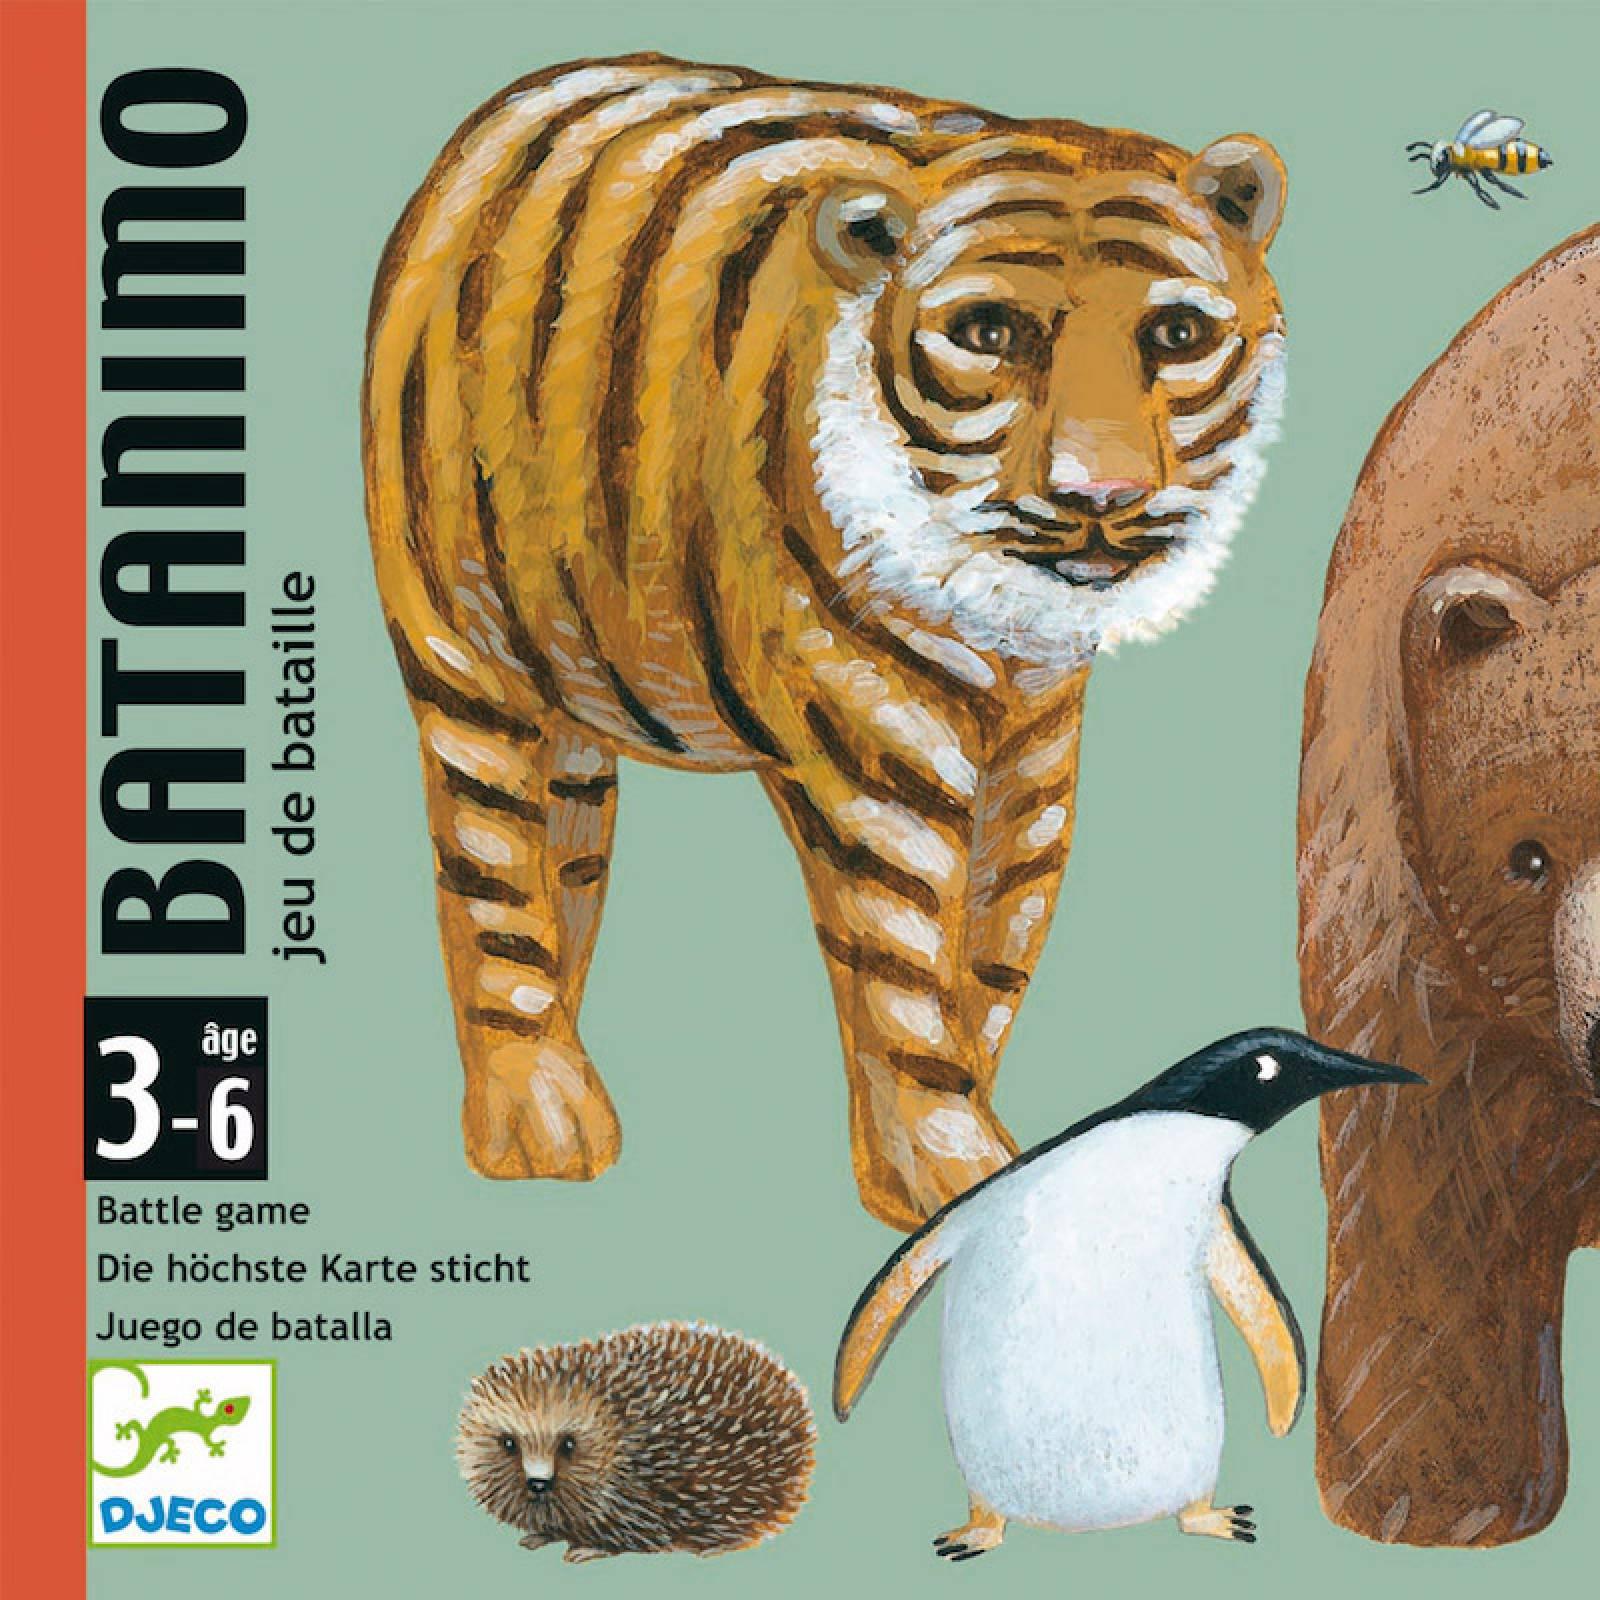 Batanimo Card Game - Battle Animal Game 3-7yrs